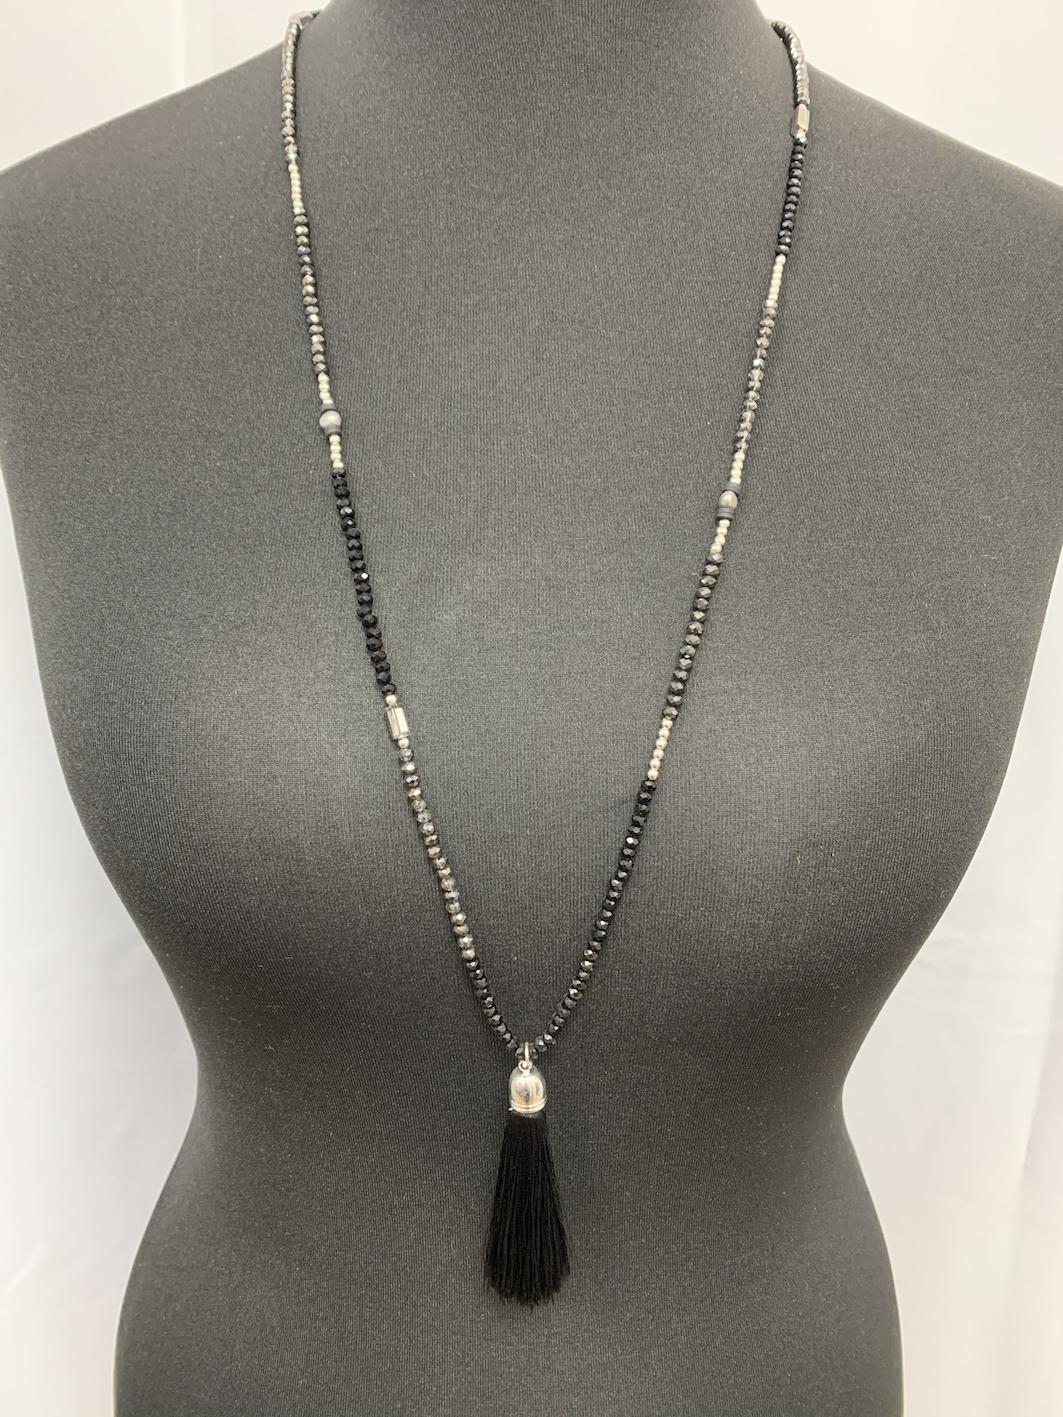 Beaded Tassel Necklace - Various